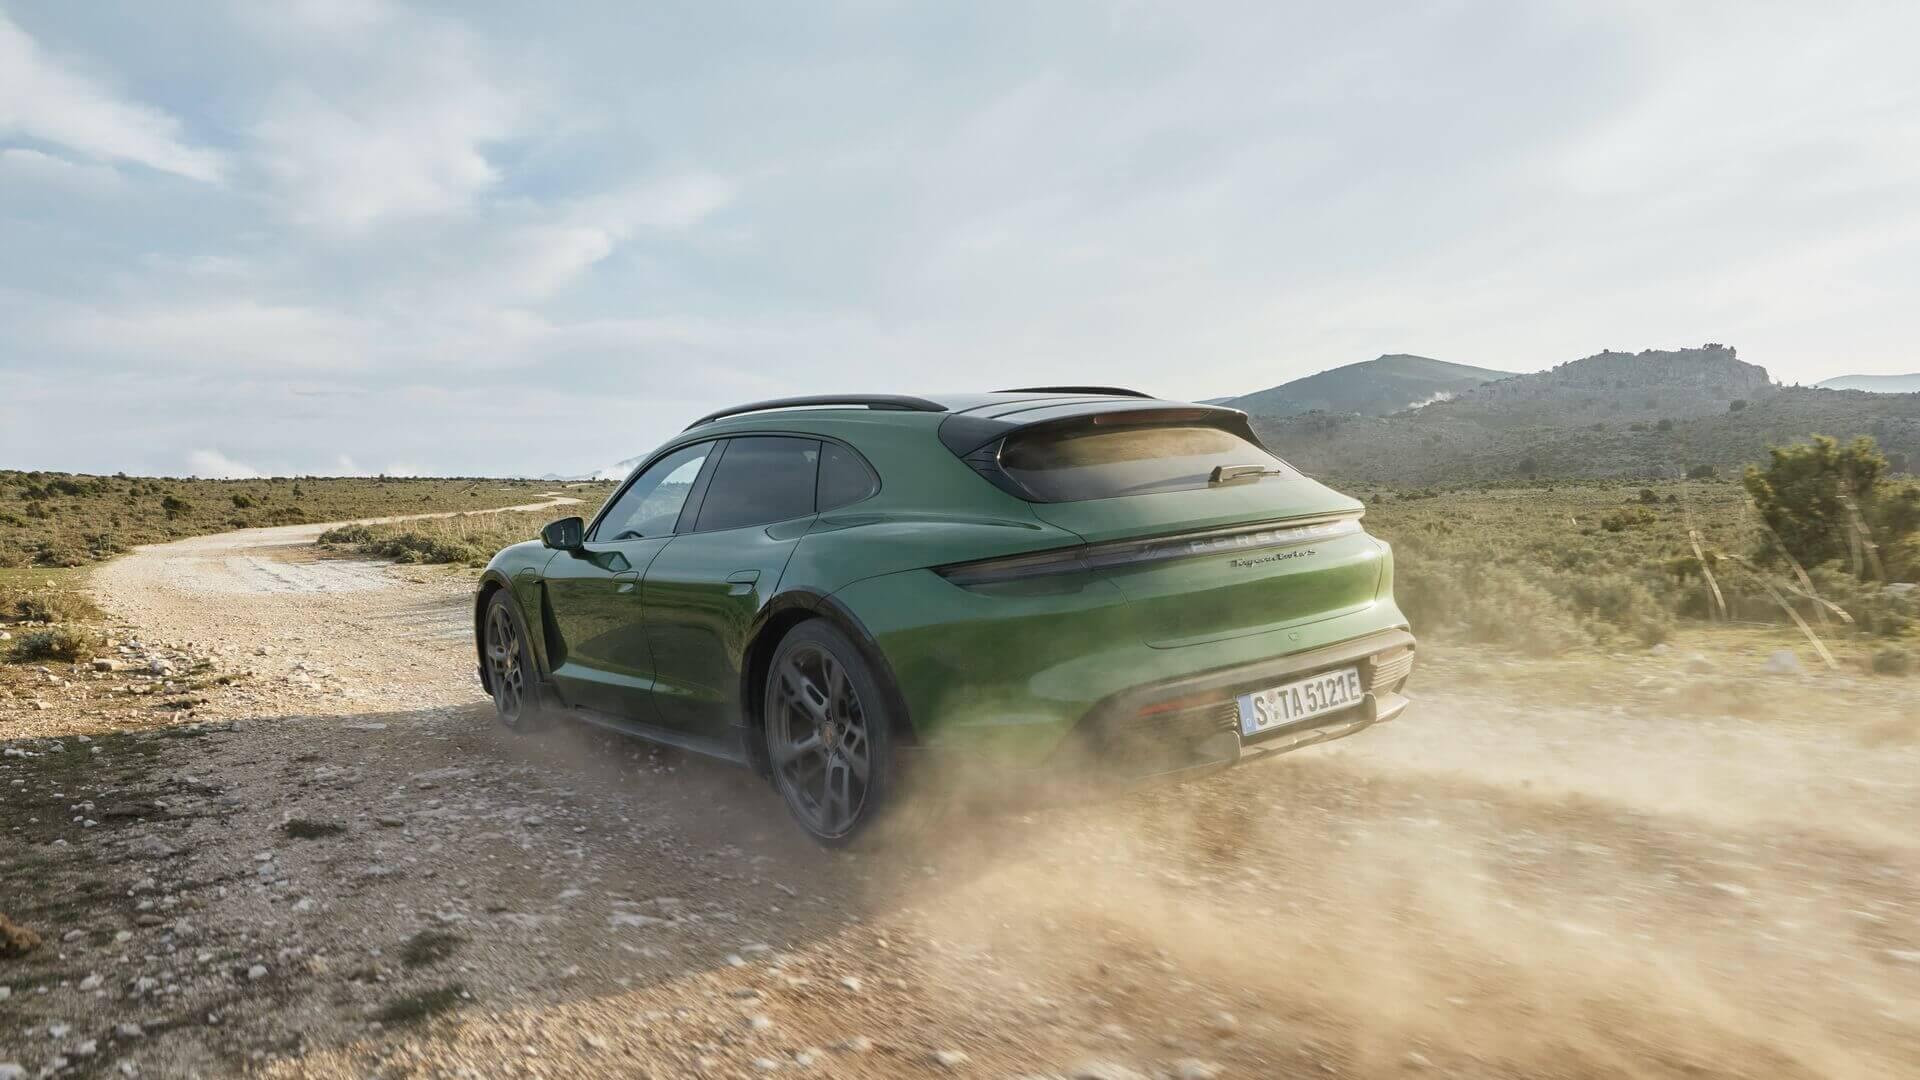 Porsche Taycan Cross Turismo: универсал среди электрических спорткаров